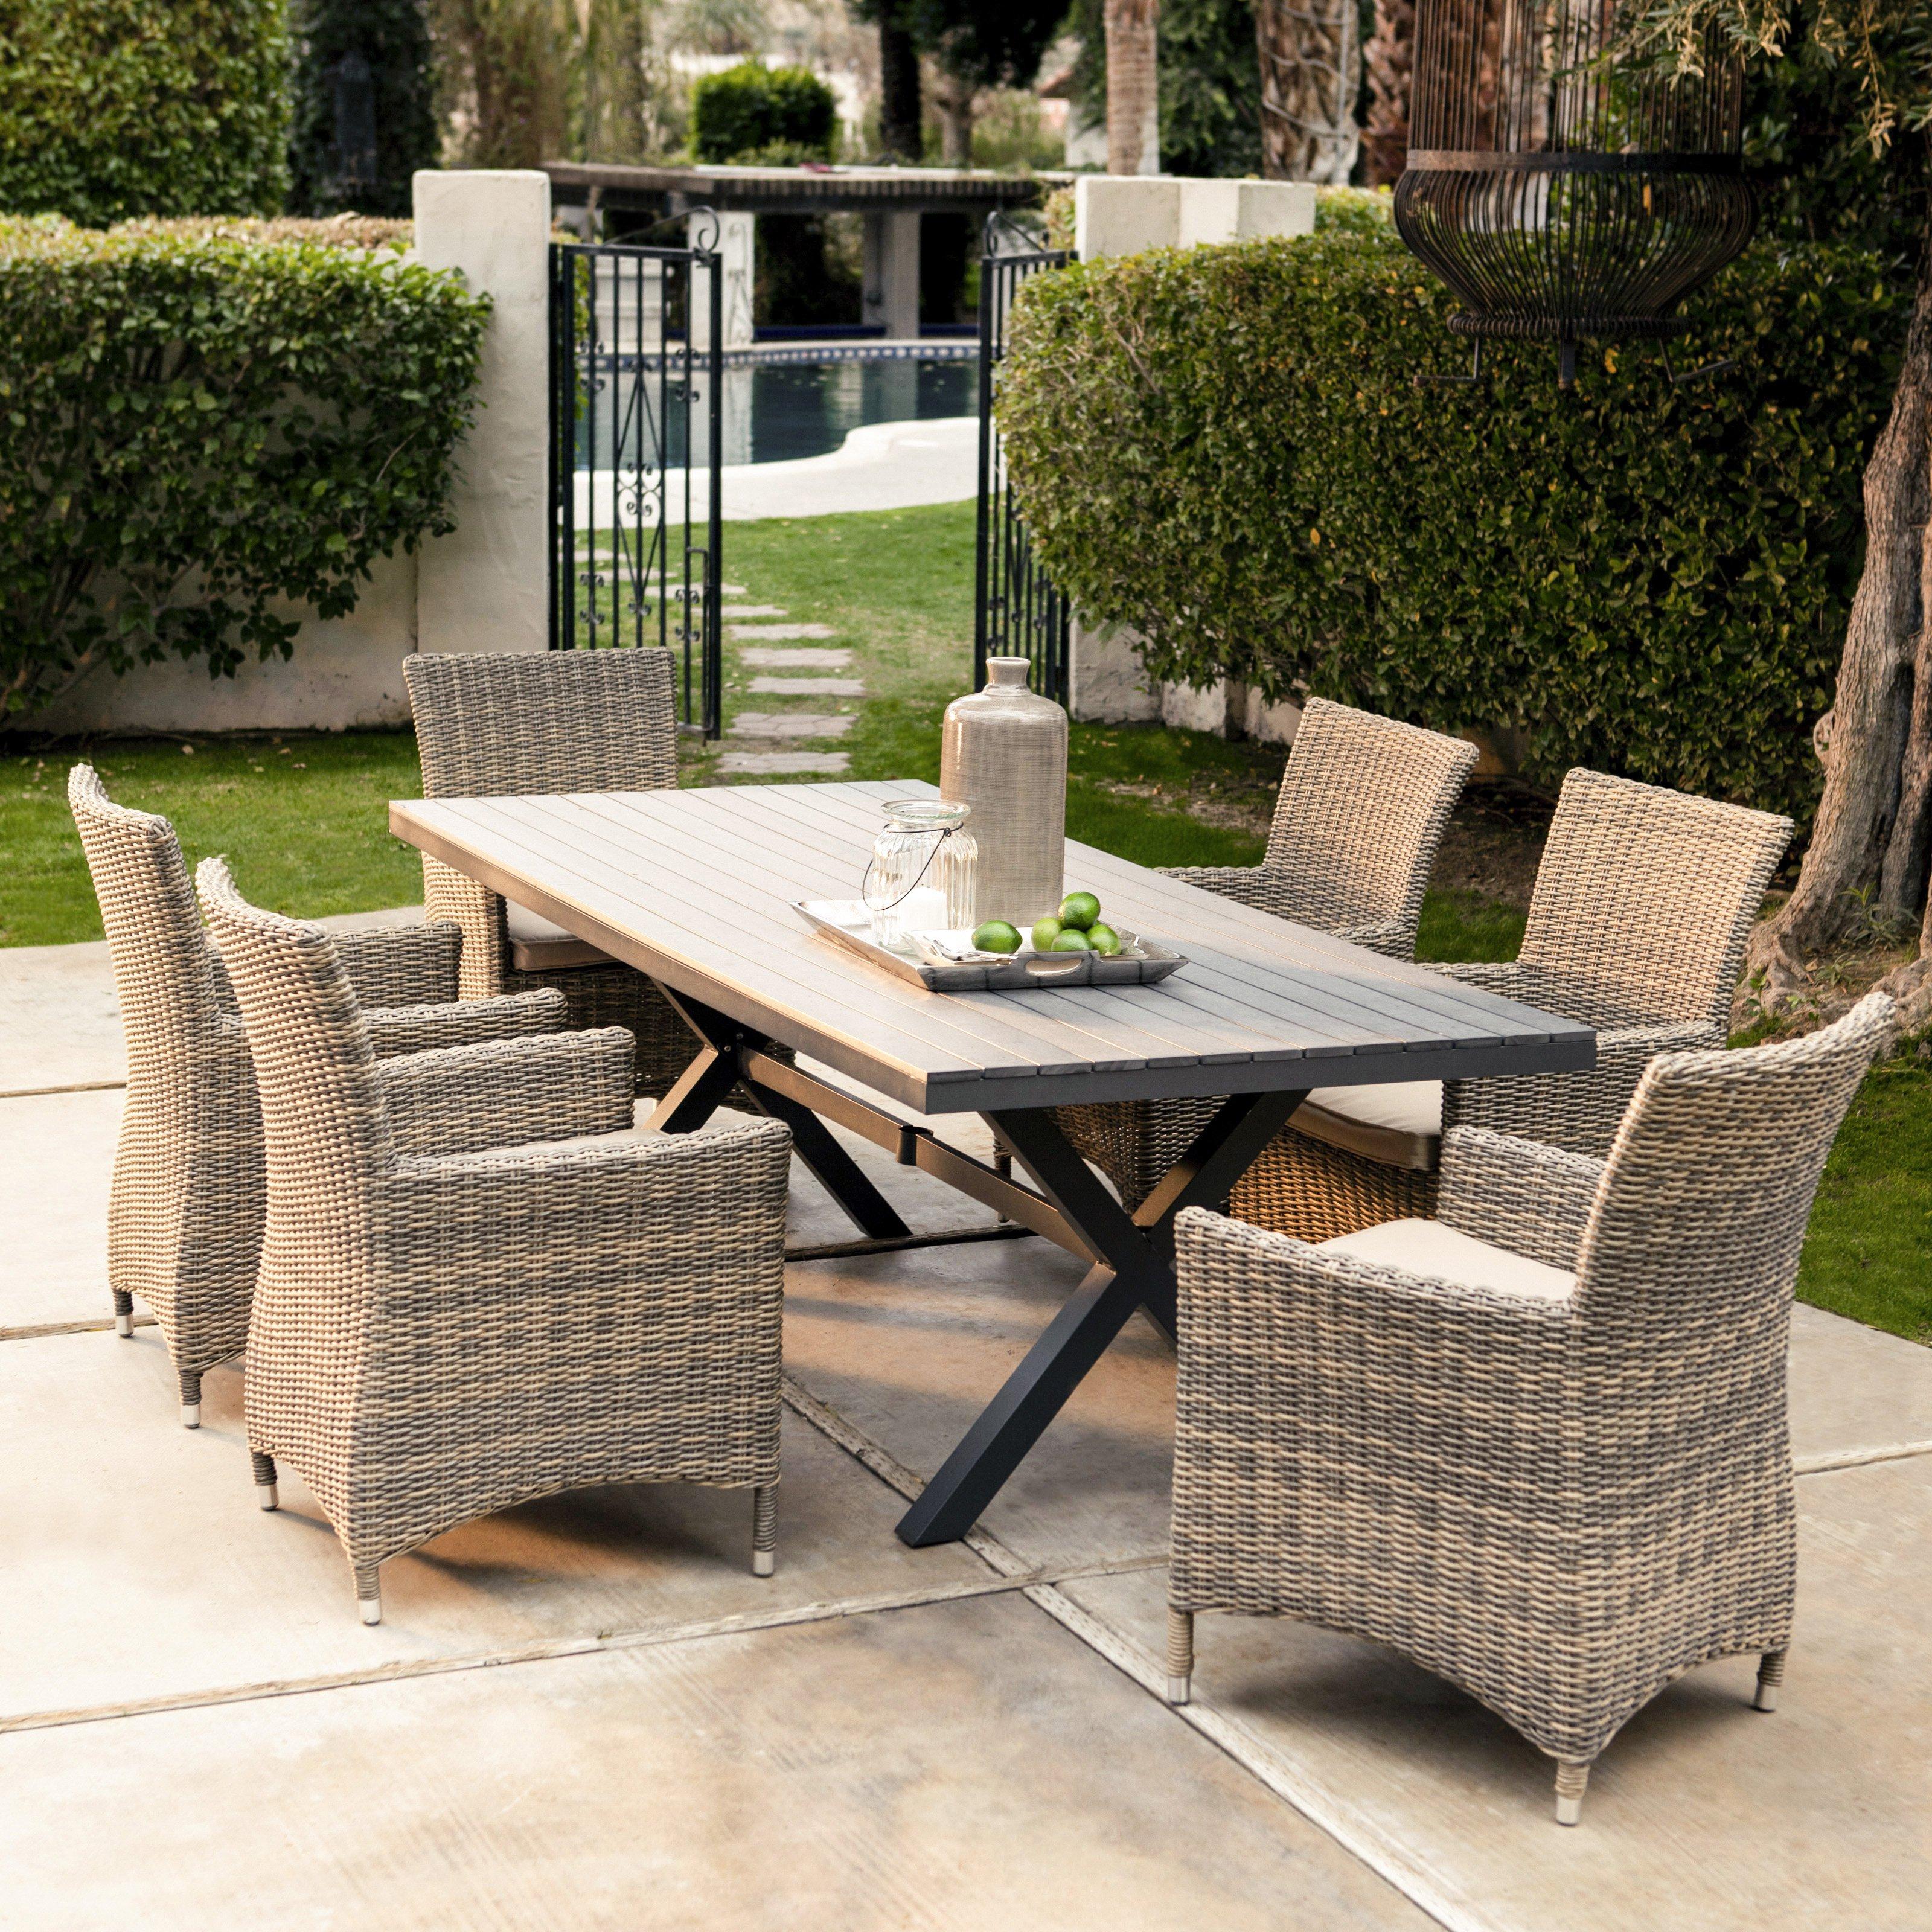 wicker patio set belham living bella all weather wicker 7 piece patio dining set - HZMQDVQ